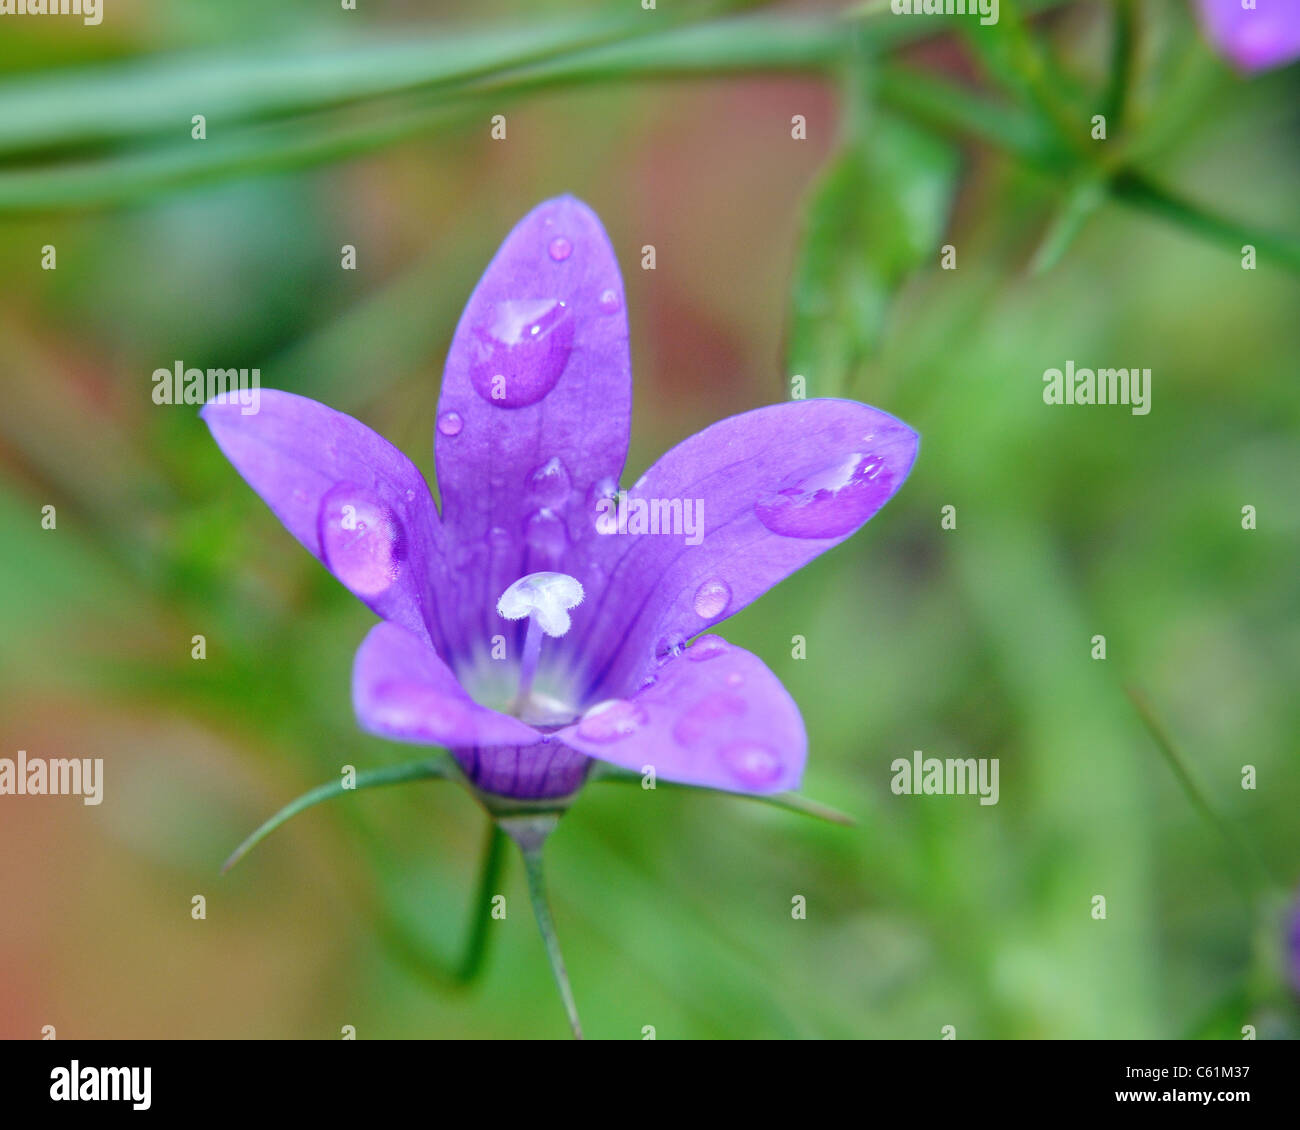 Cabeza floral closeup tarjeta de felicitación simpatía púrpura verde cerca de verano macro Imagen De Stock